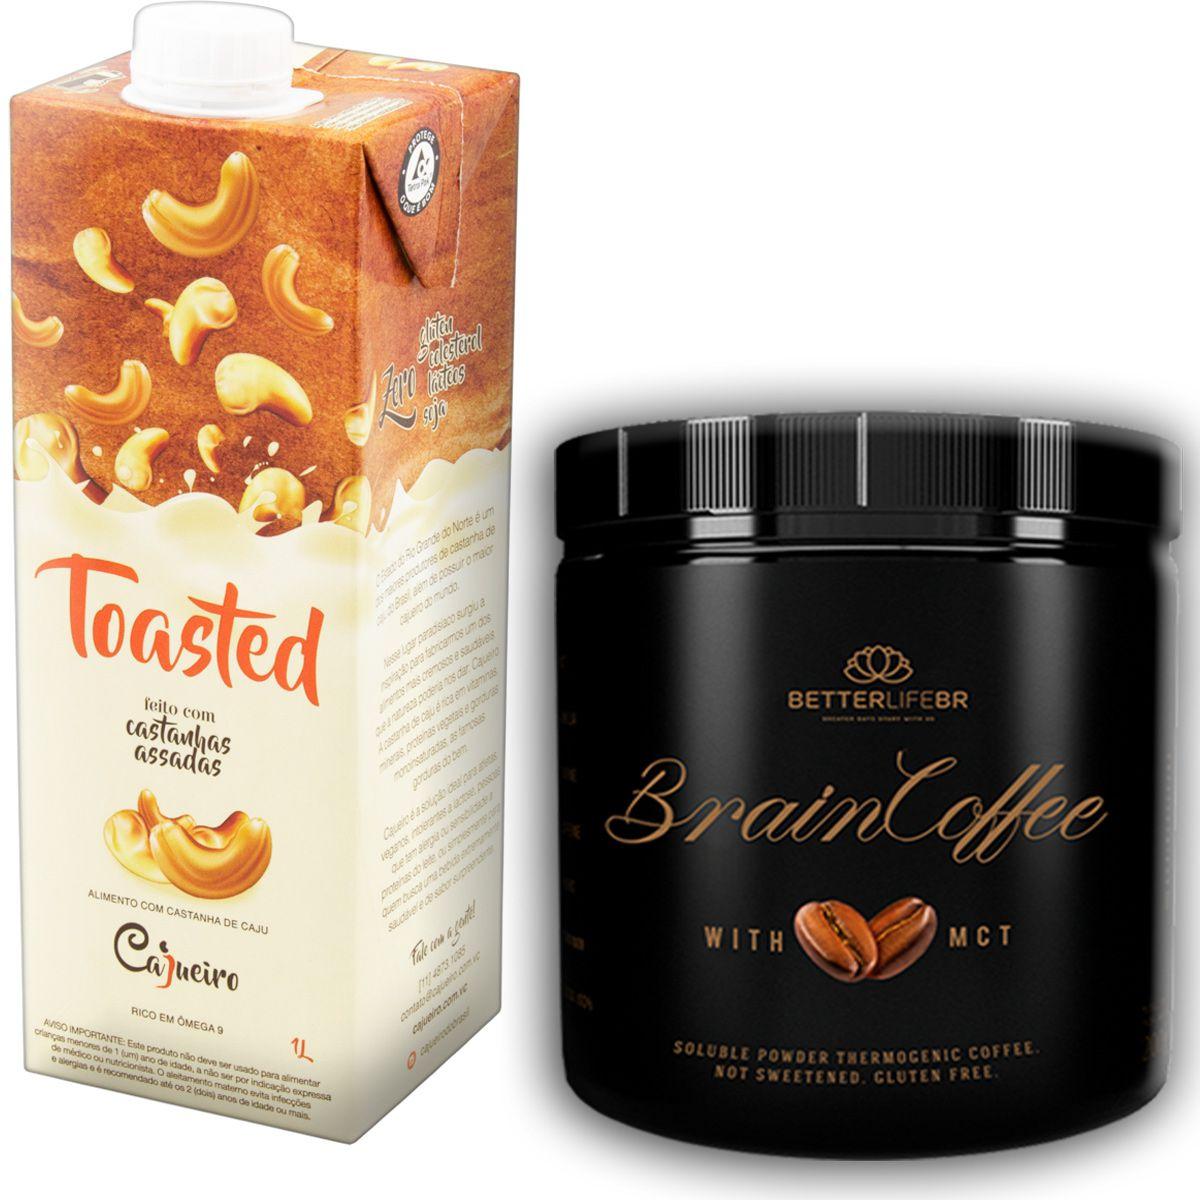 1 Brain Coffee com MCT 200g e 1 Leite Vegetal Toasted 1lt